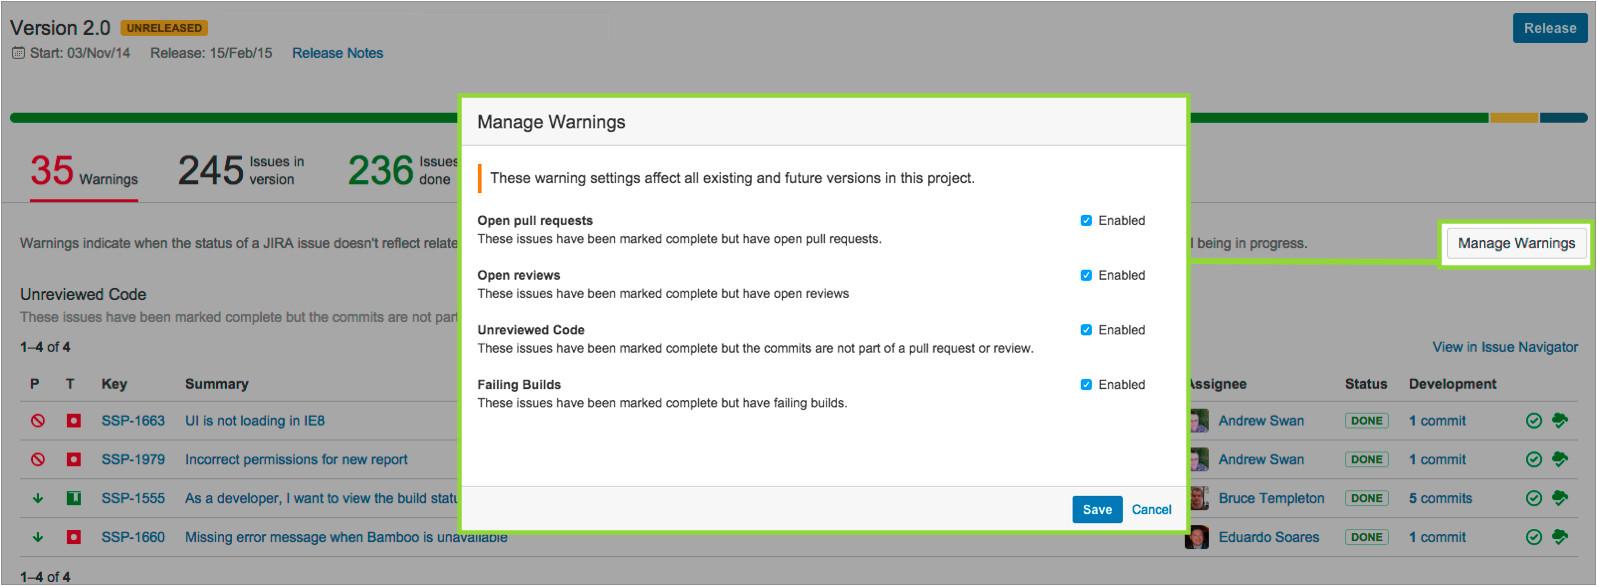 jira versionprogress managewarnings png